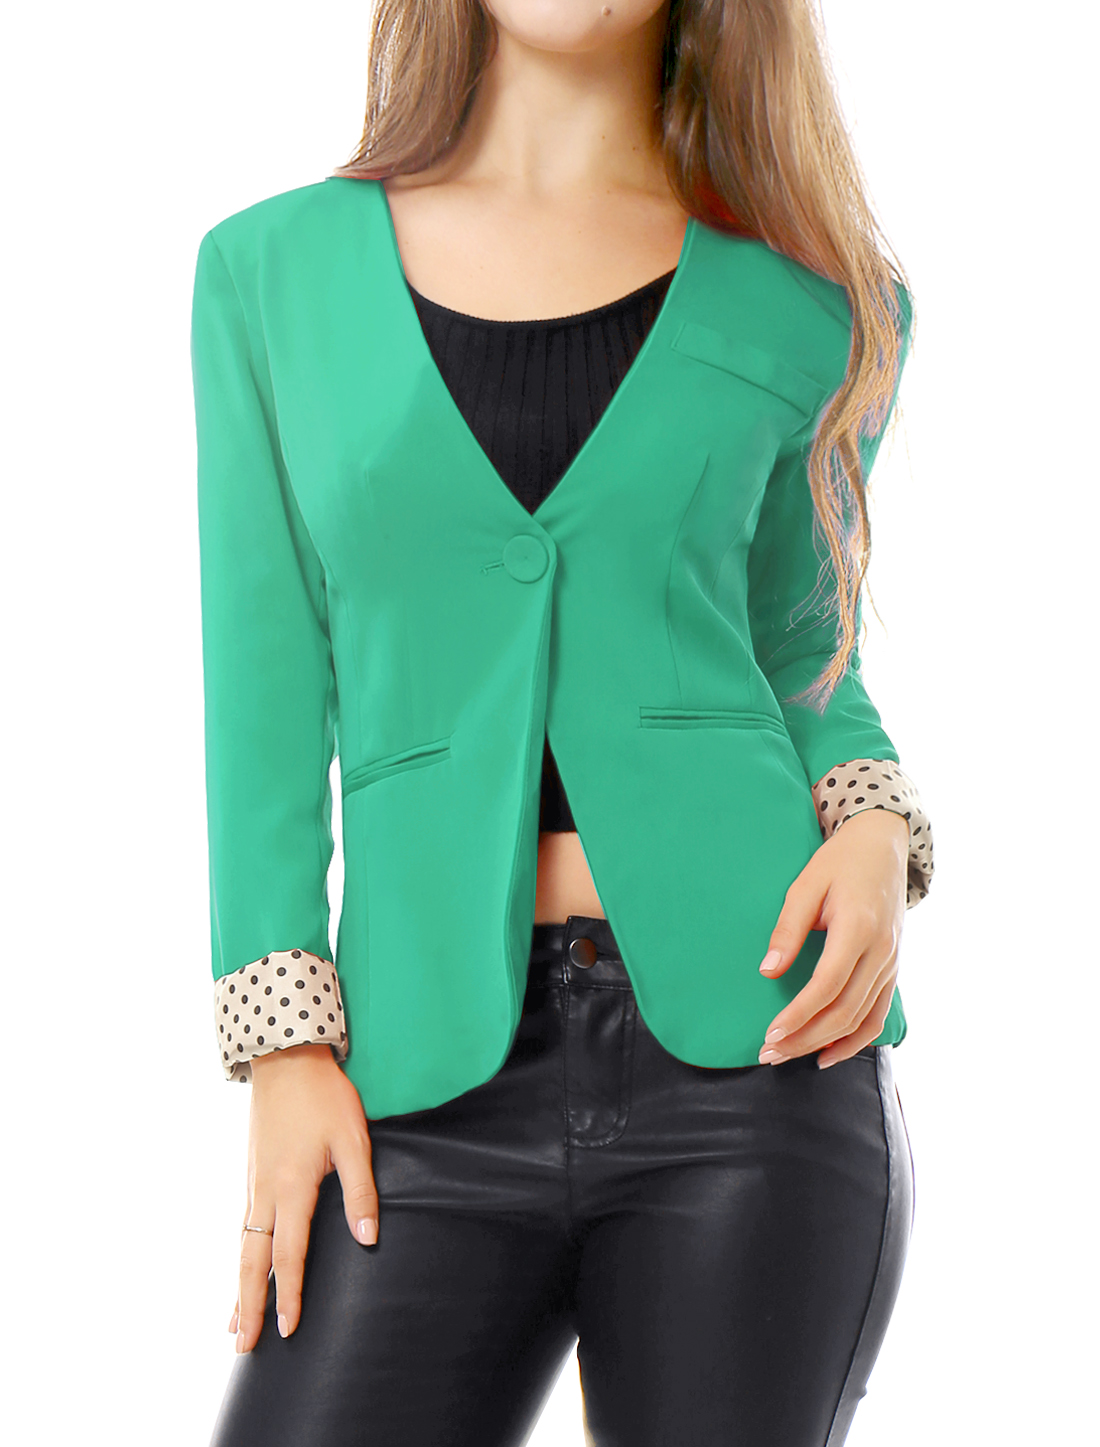 Women Decorative Pockets Cuffed Dots Lining Fashion Blazer Green XL